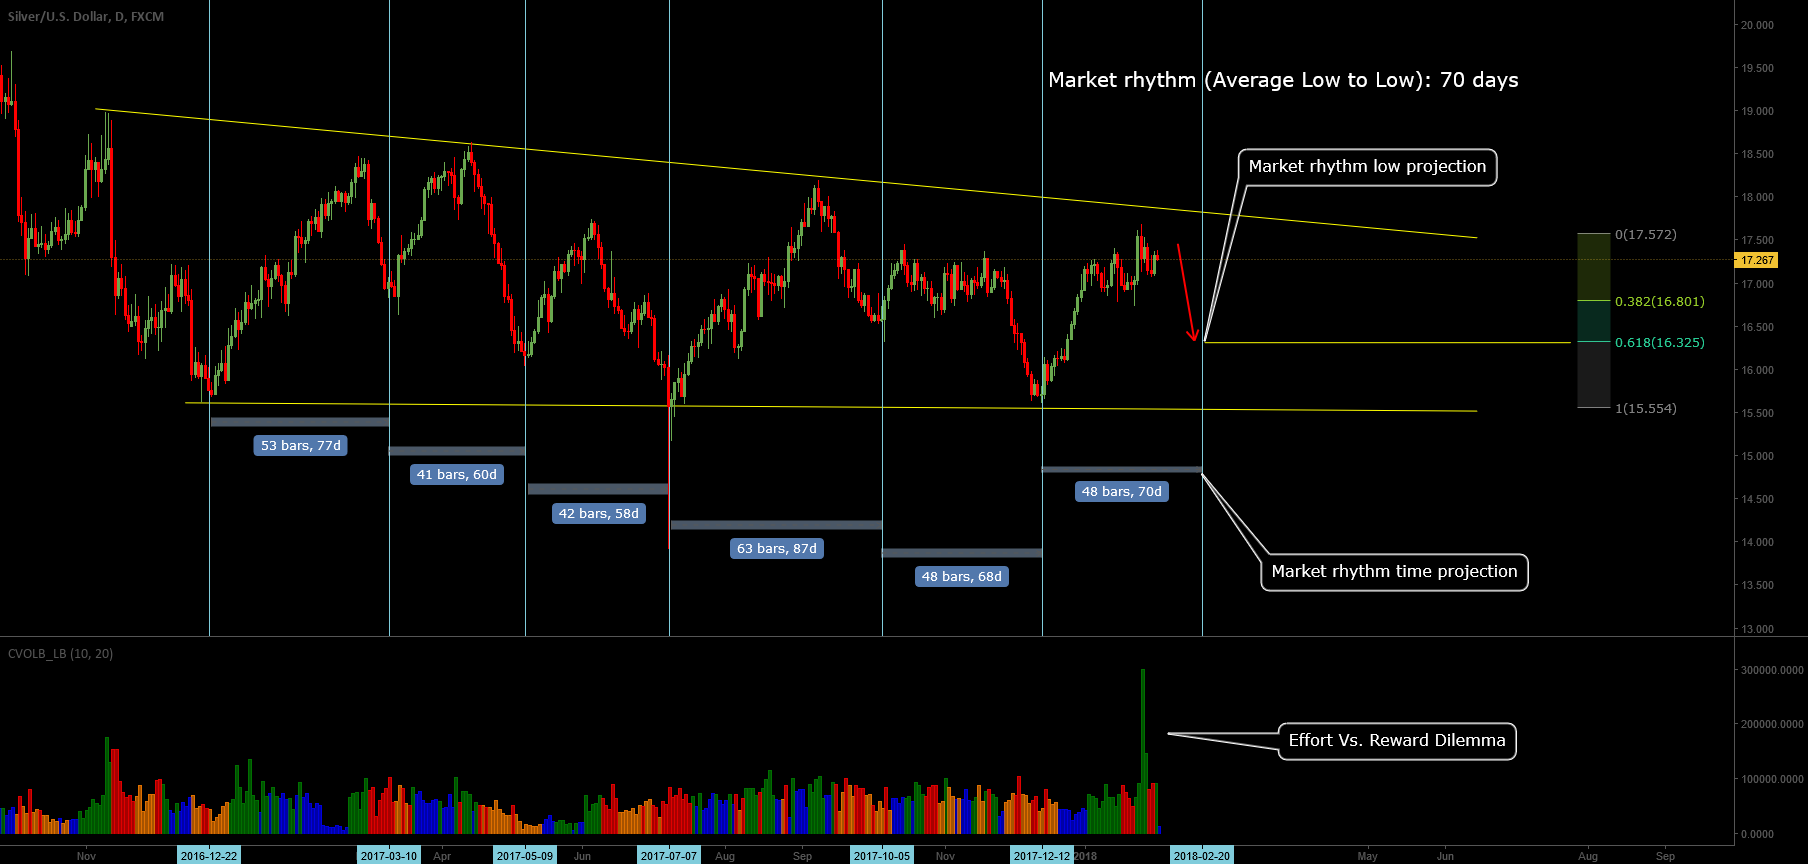 Market Rhythm Projection